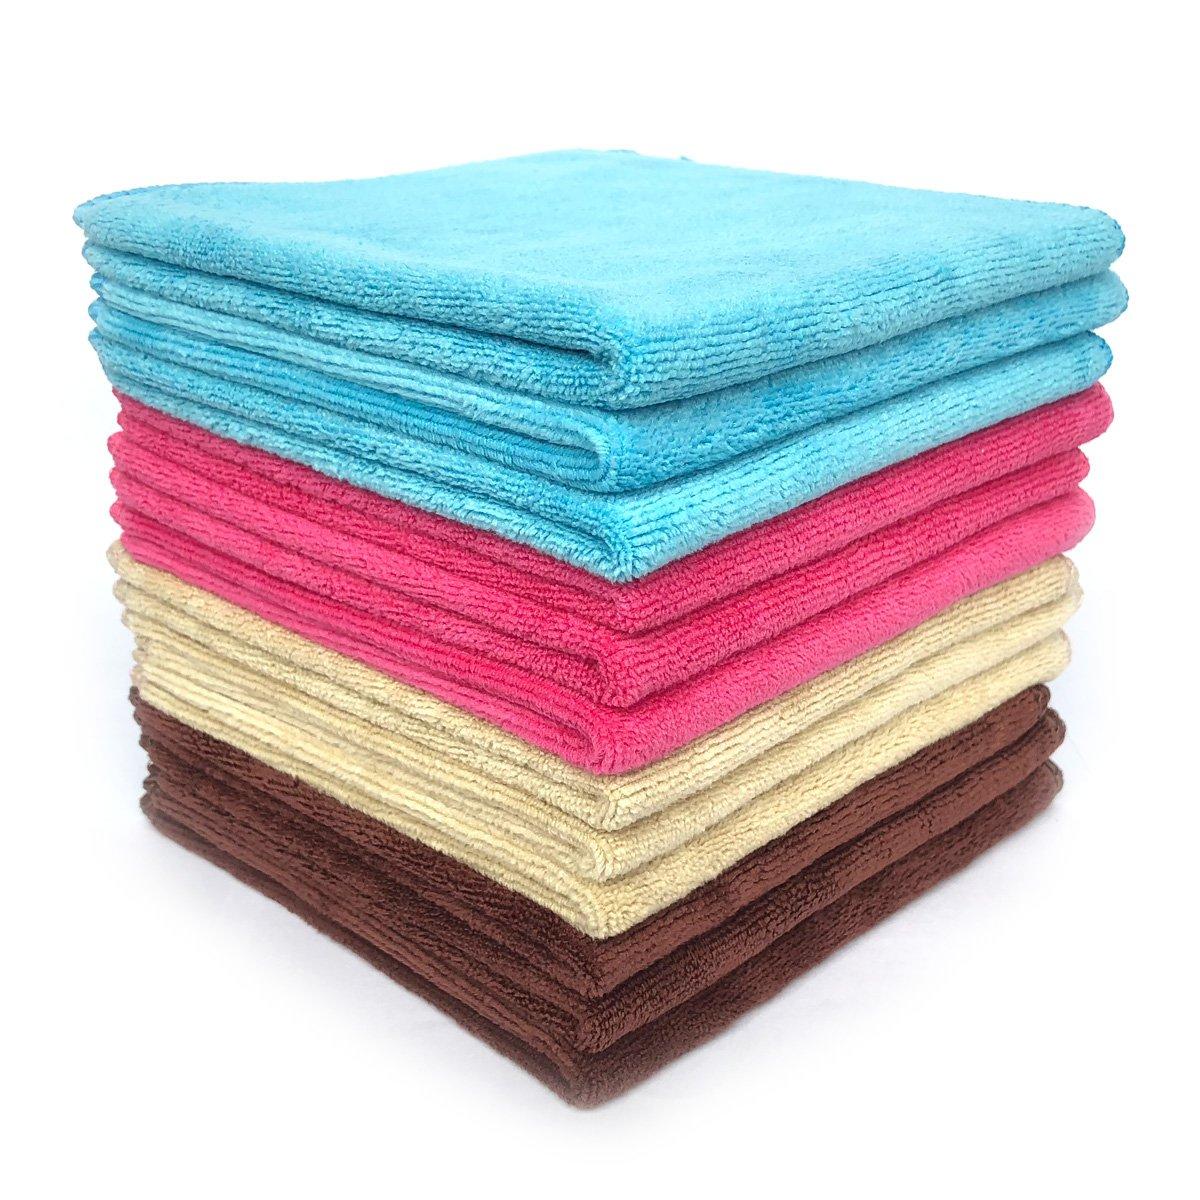 Multi-purpose Microfiber Cleaning Cloths Washcloths 12 Pack (Multi)